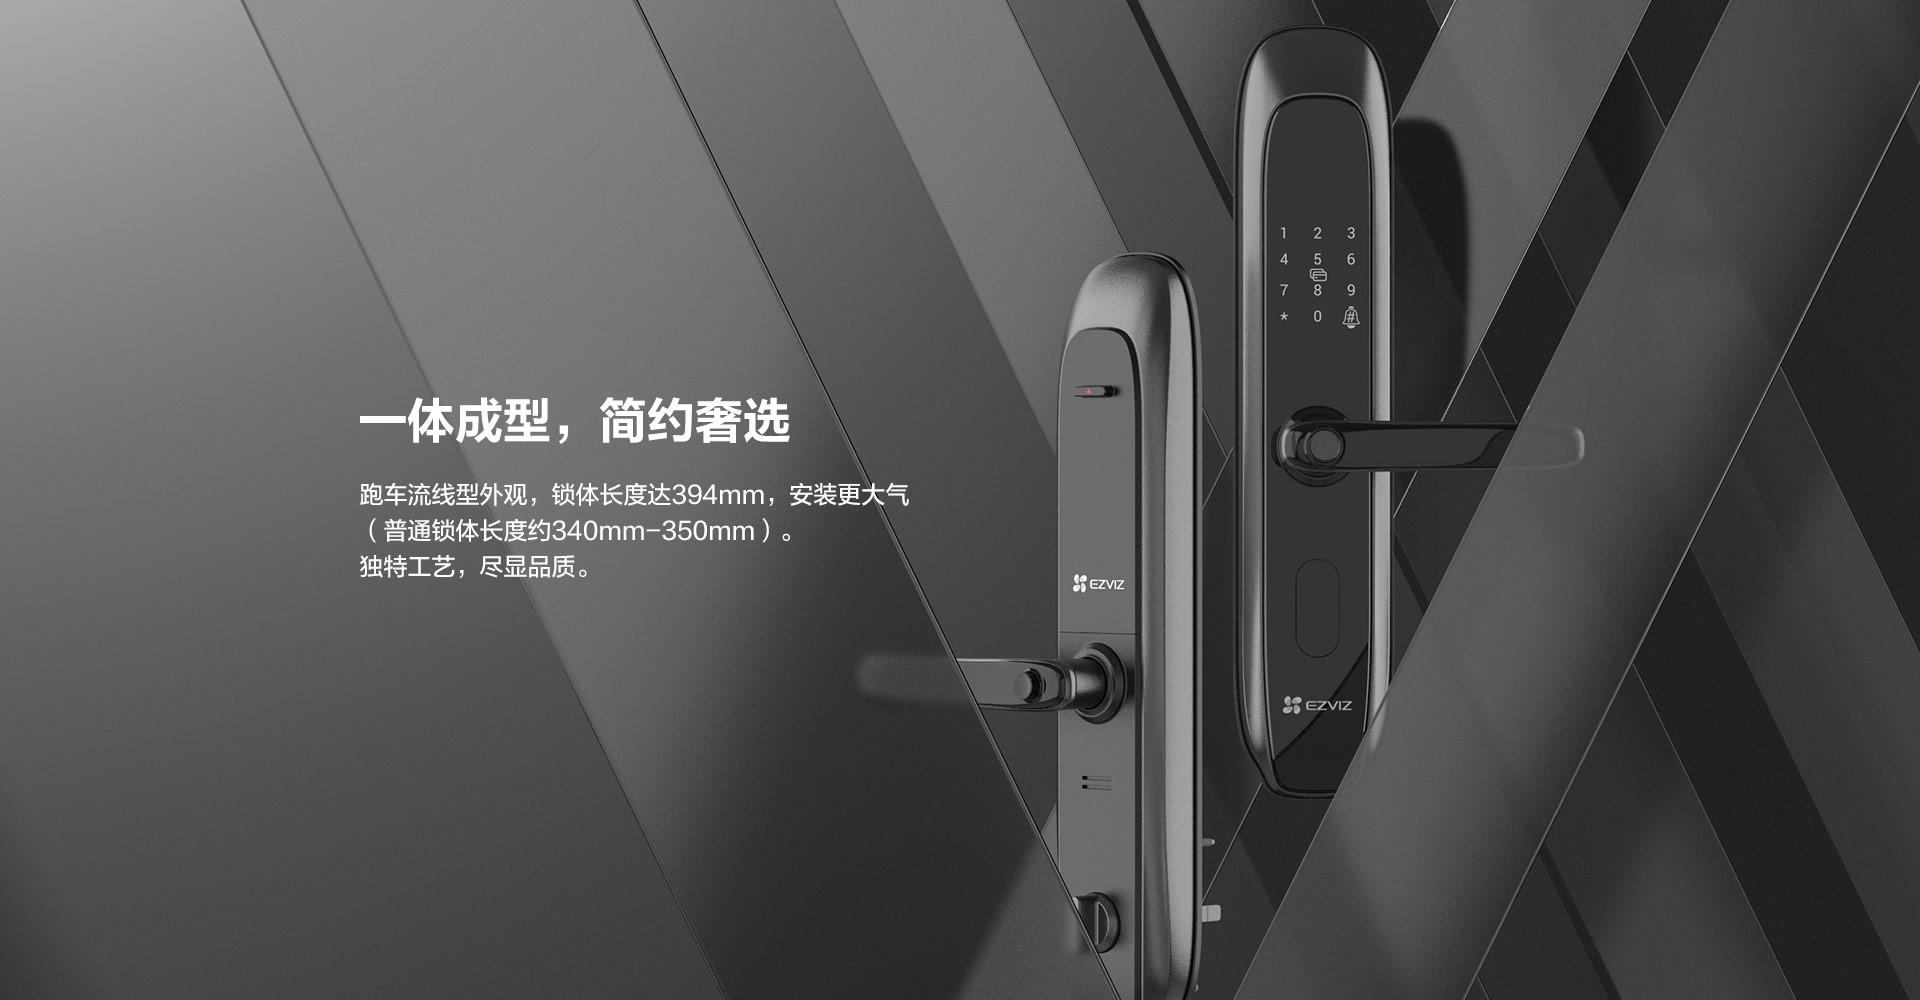 DL20C-web_16.jpg